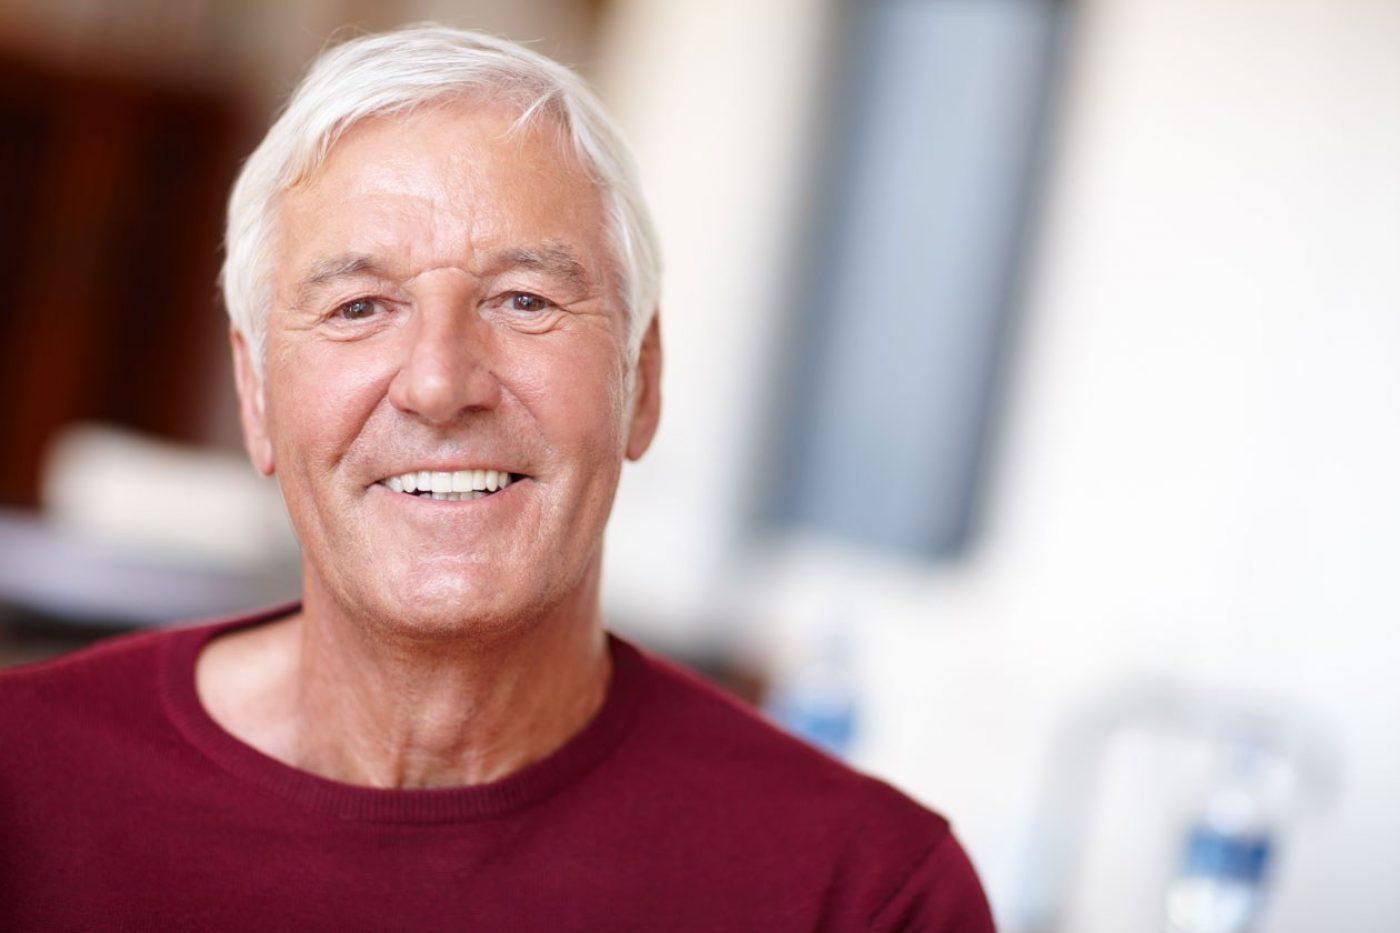 glasgow Dental Implants Implantsecureddentures